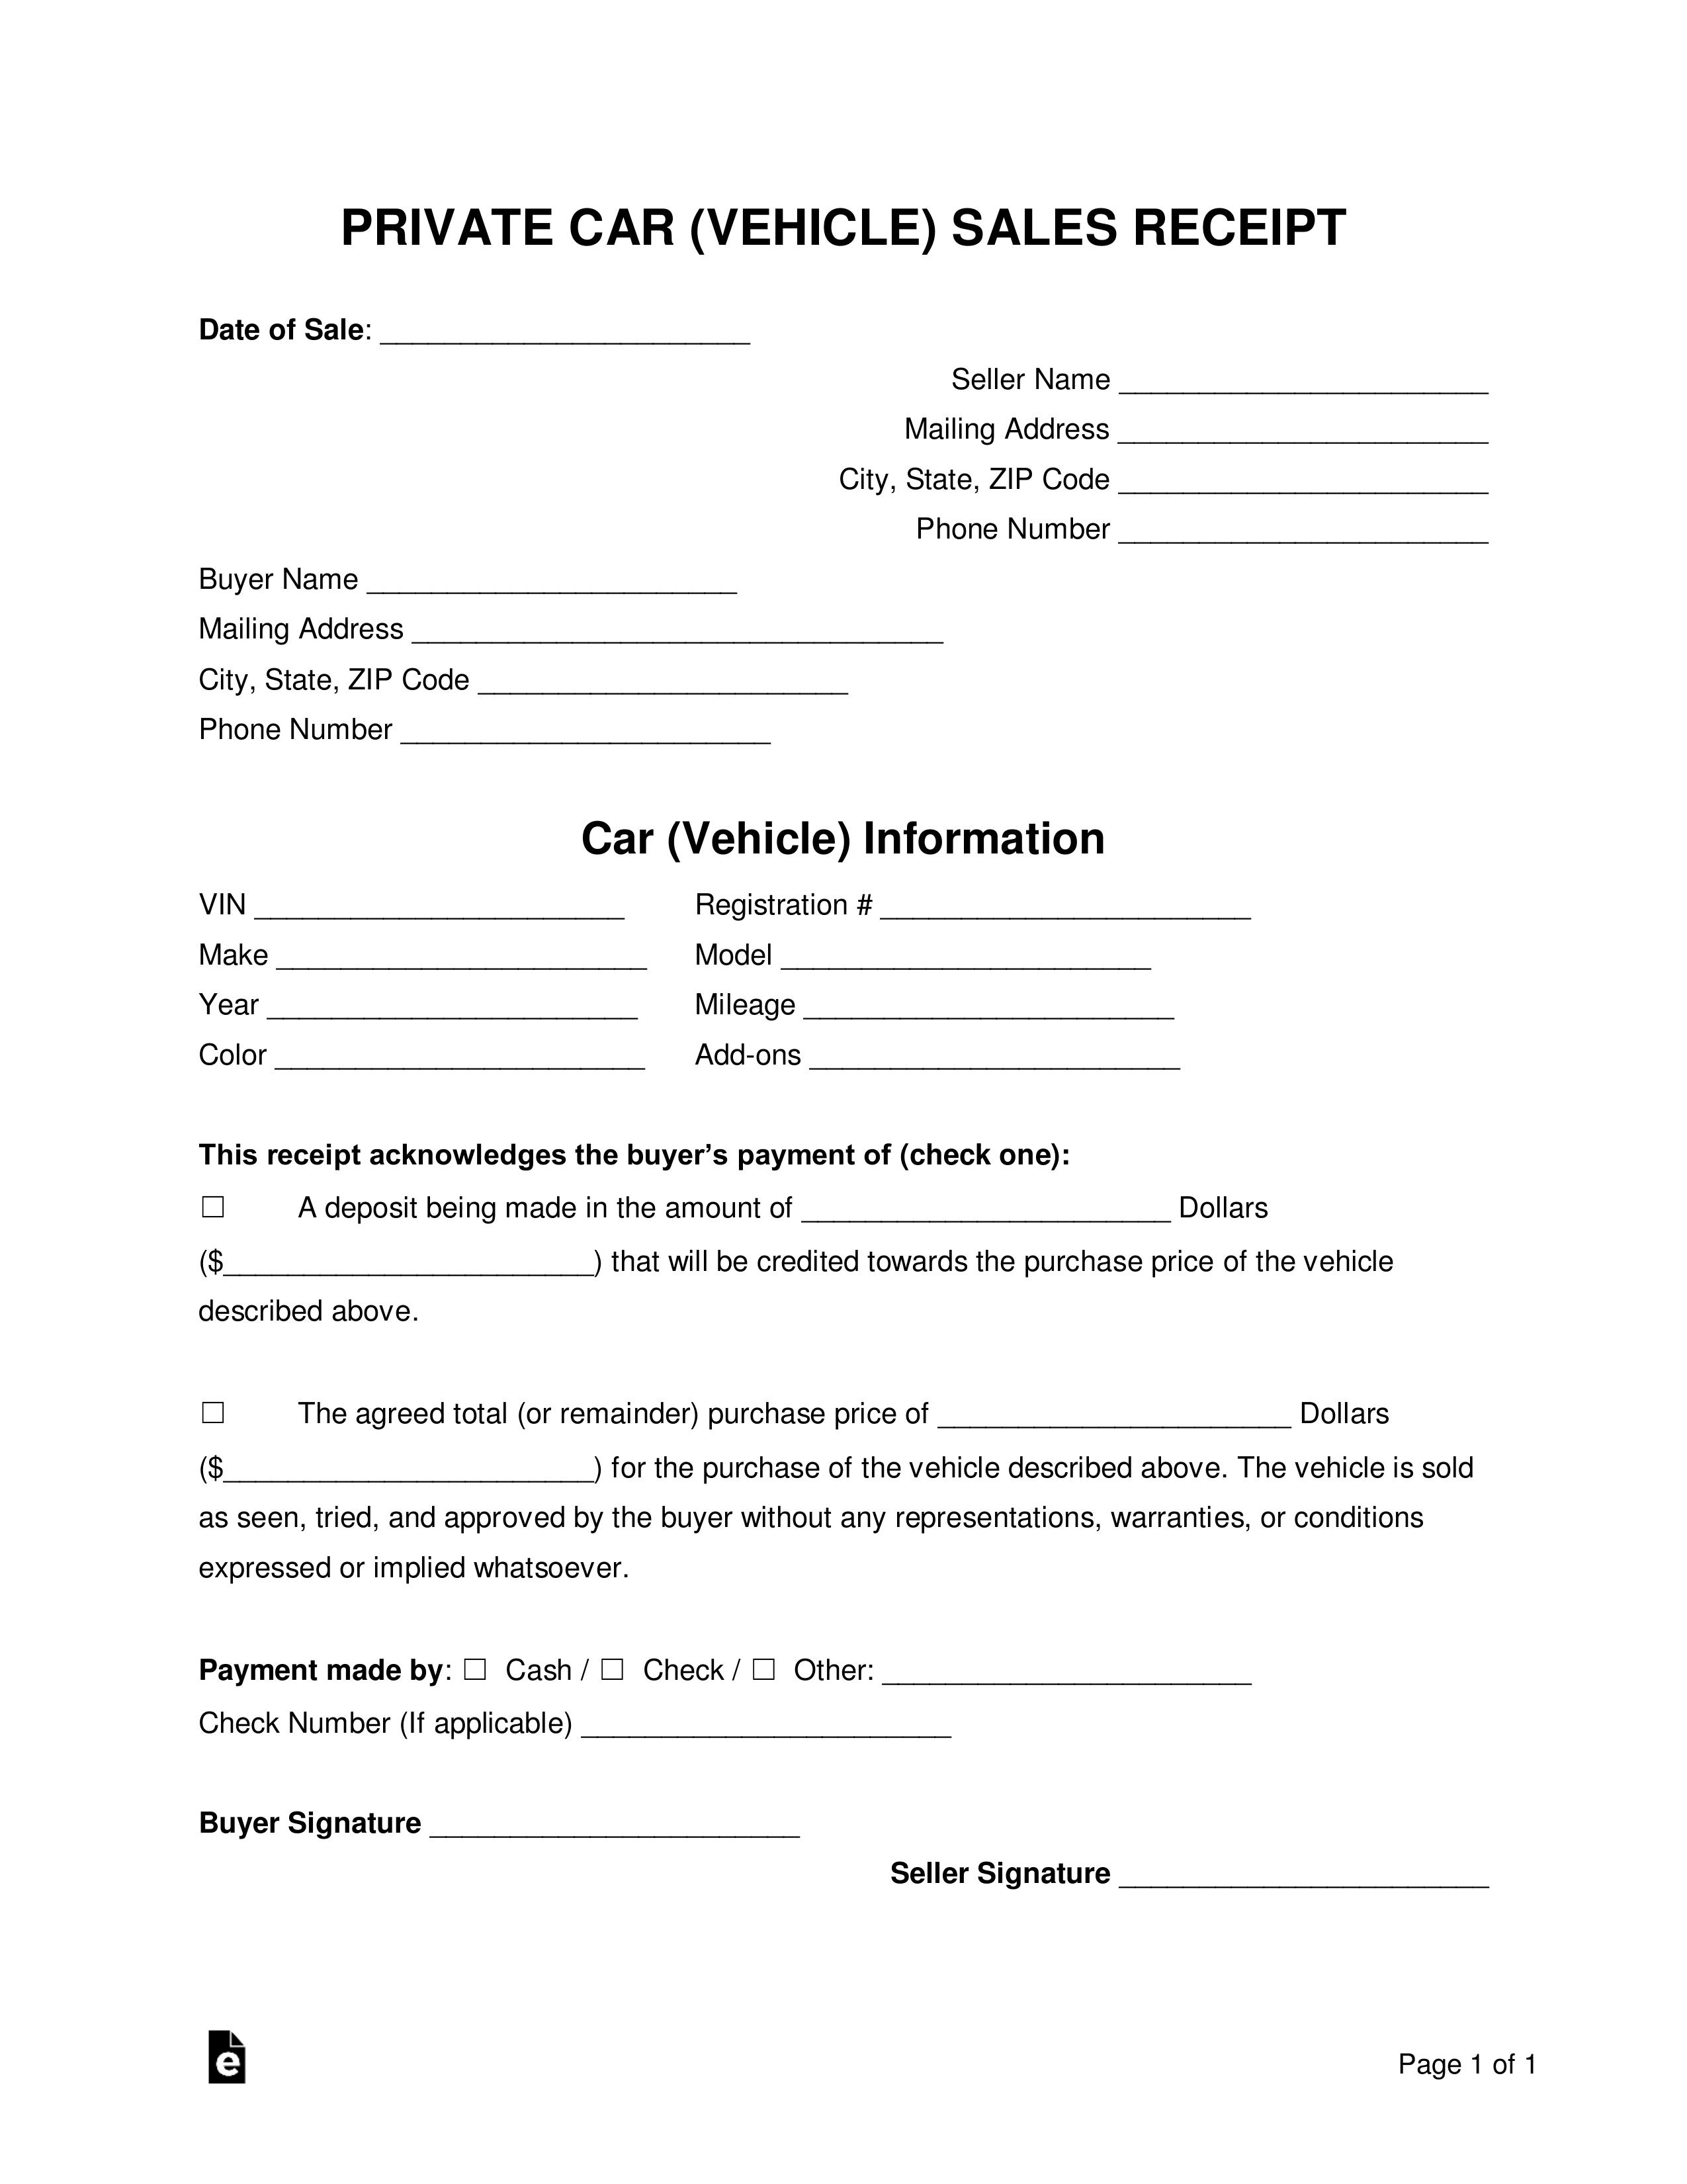 Private Car Sales Receipt Template